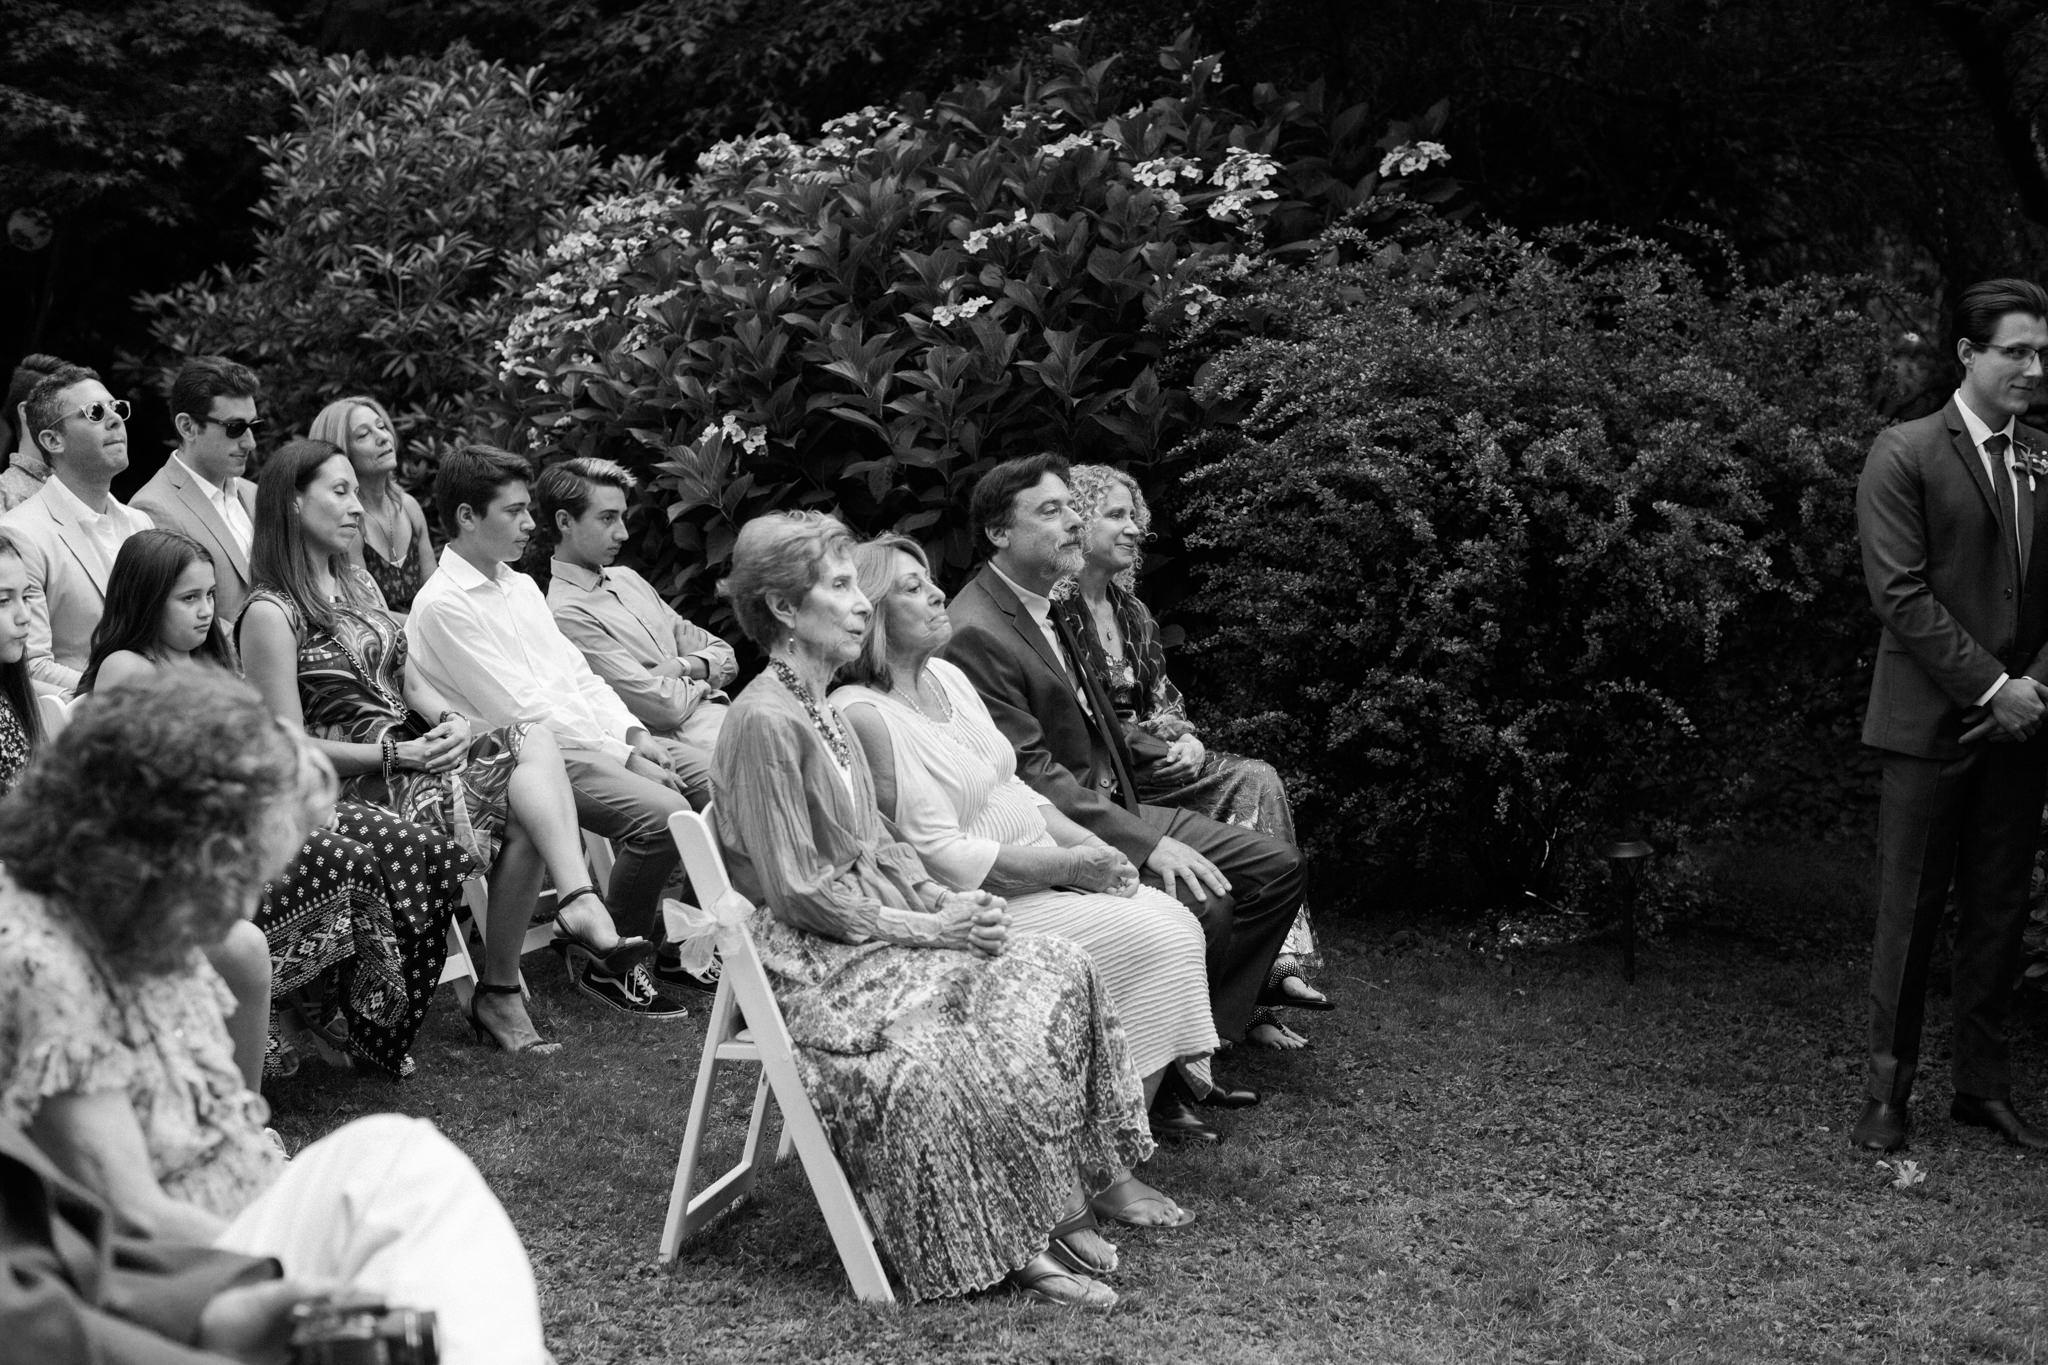 Backyard-Bainbridge-Island-Wedding-Alycia-Lovell-Photography-112.JPG